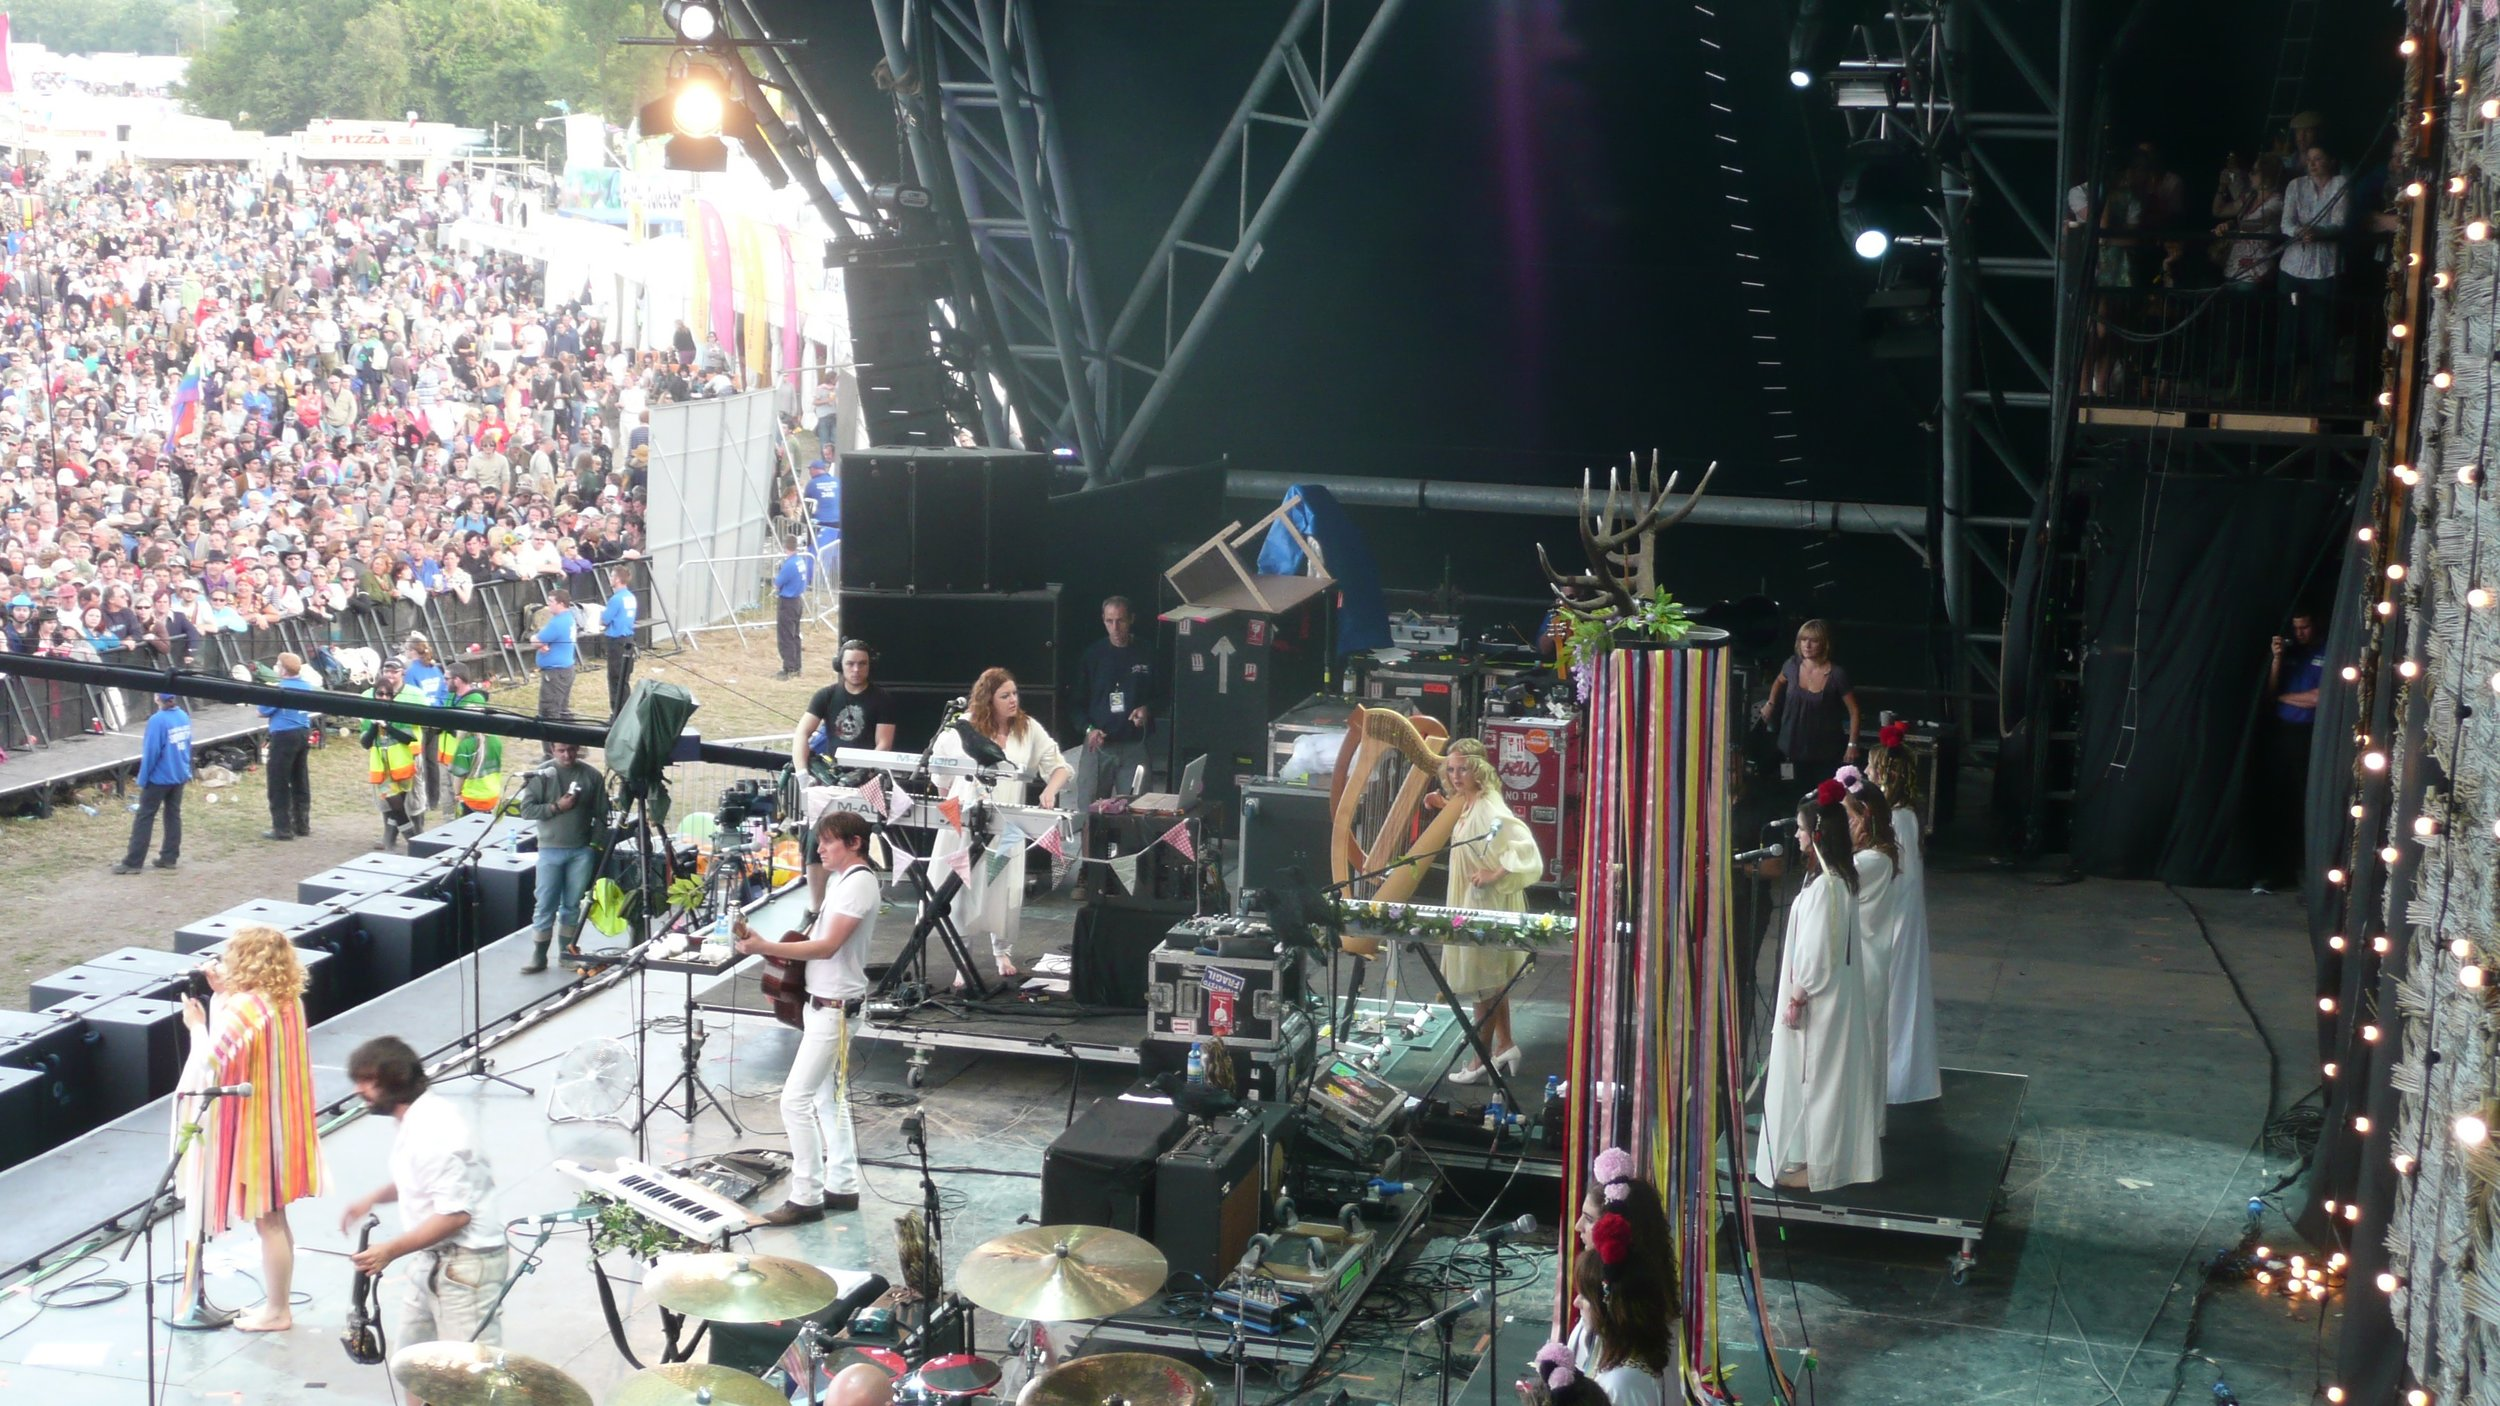 Goldfrapp at Glastonbury 2008